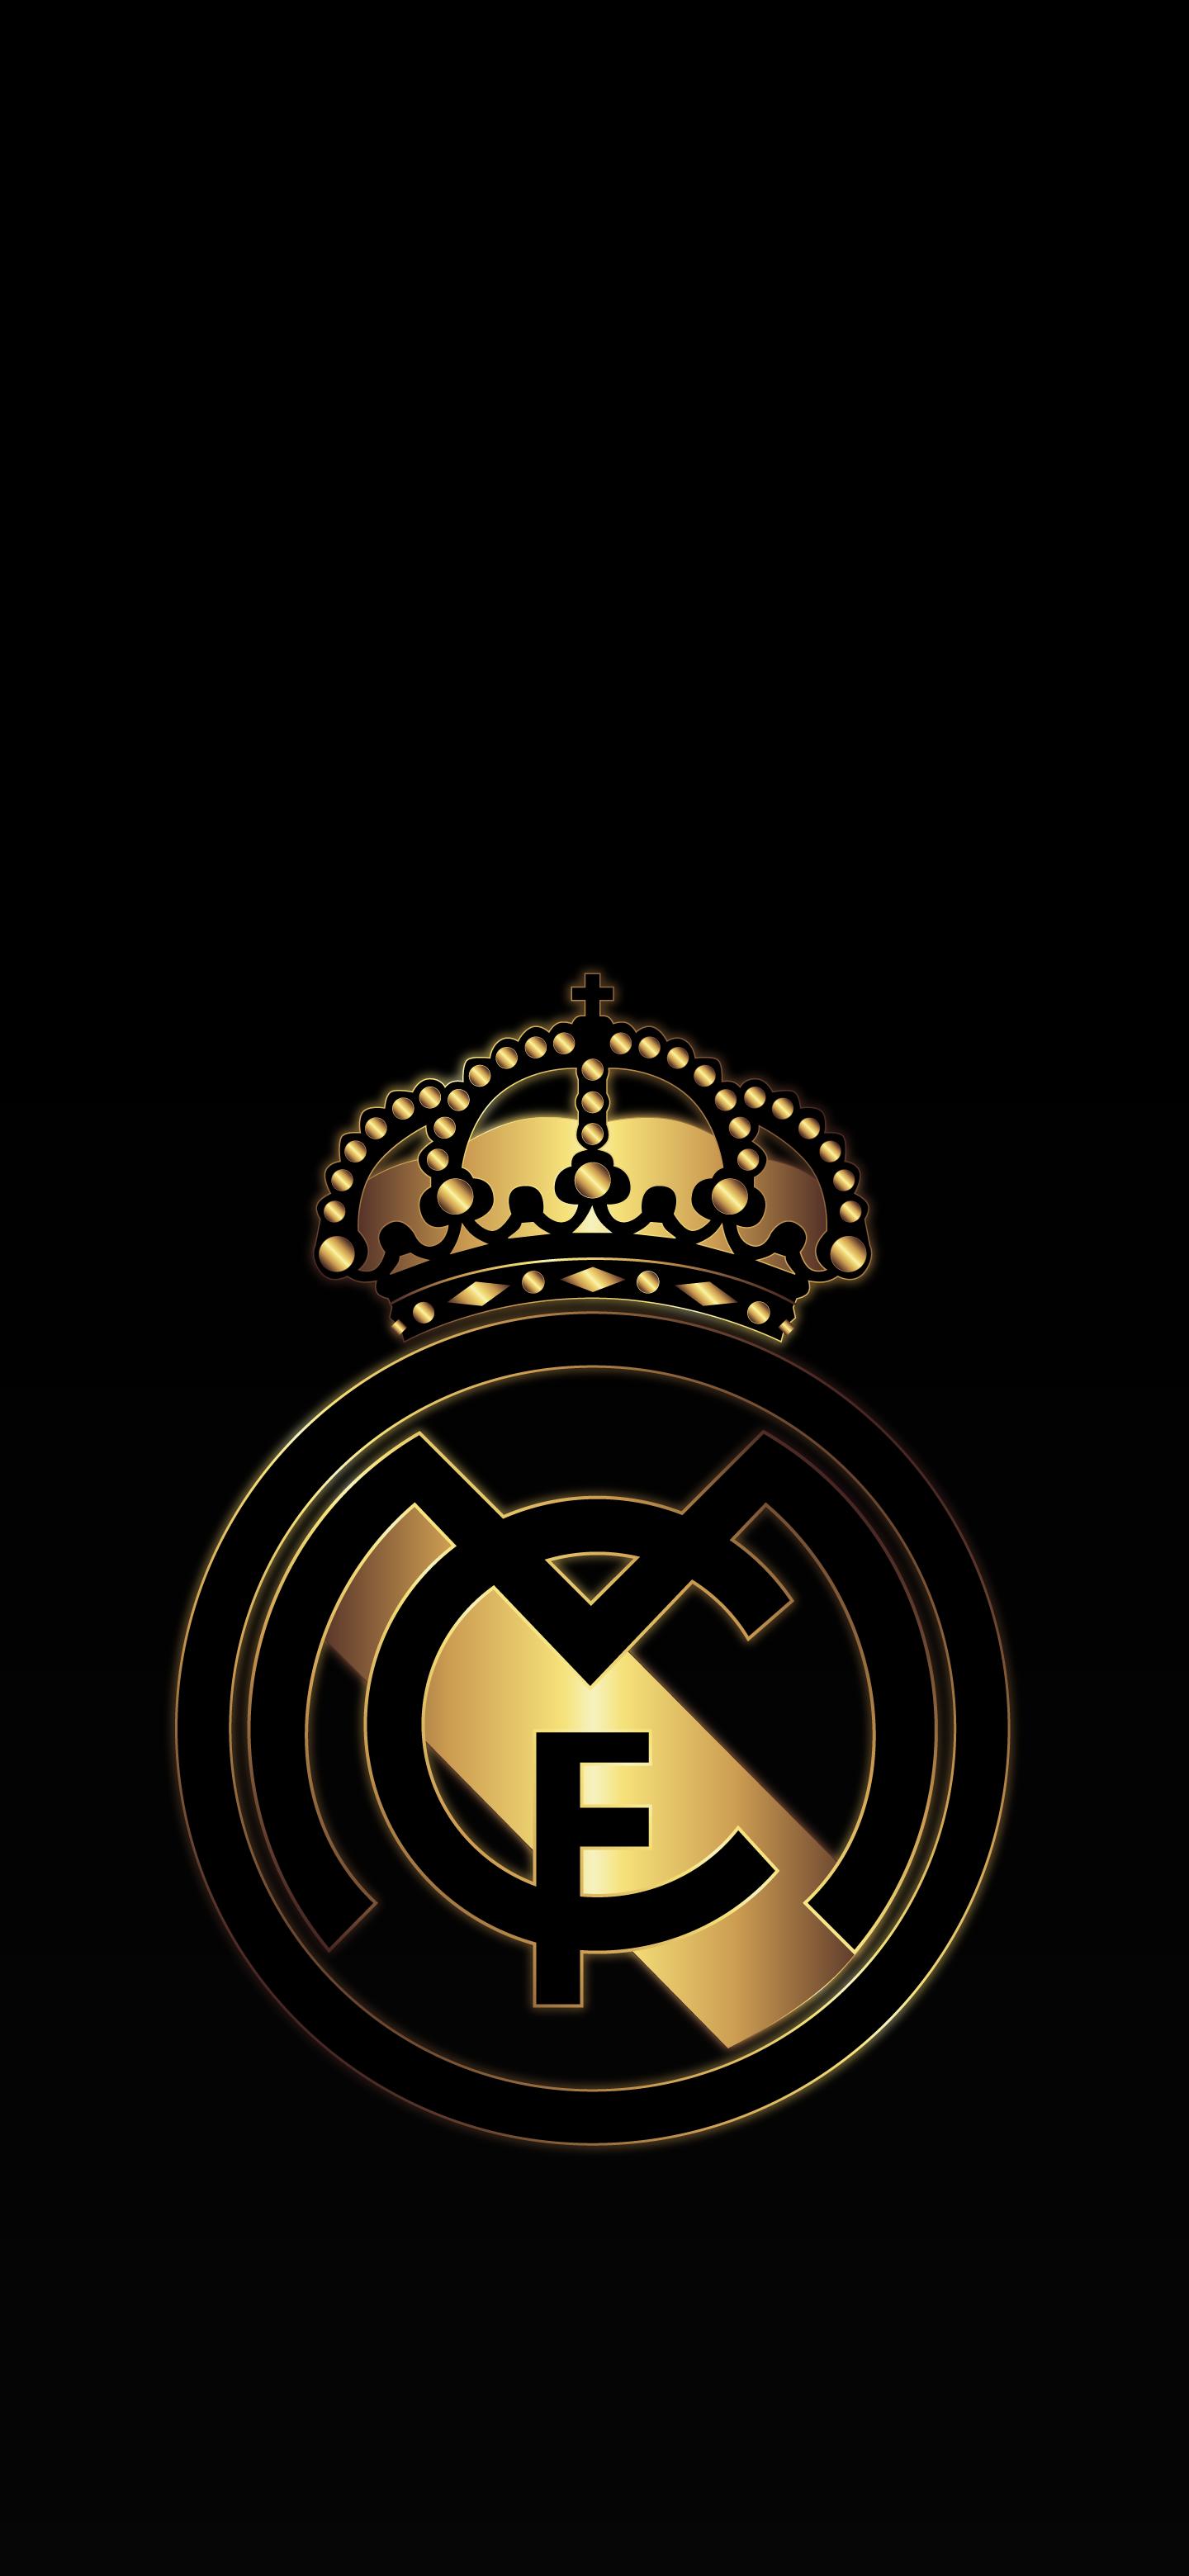 Real Madrid Wallpaper - Real Madrid Wallpaper Free Desktop ...